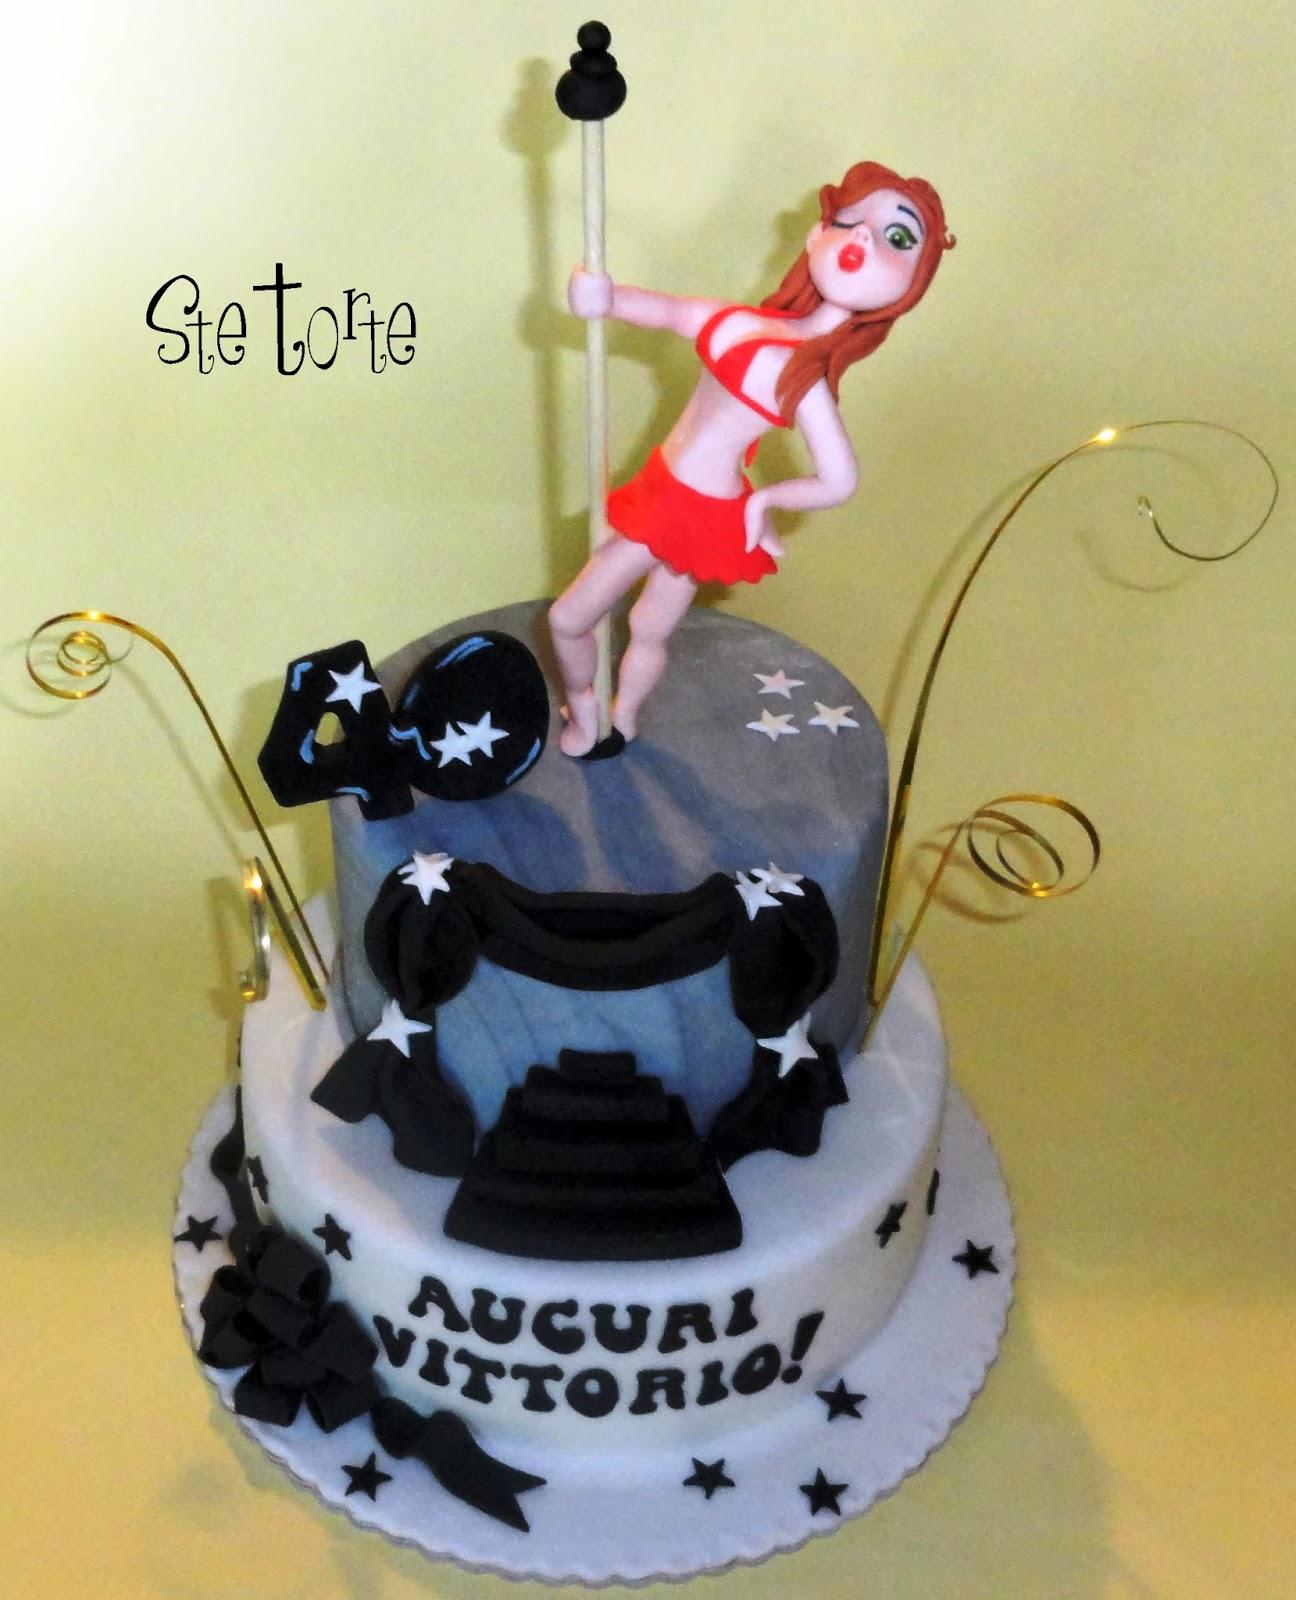 Ste Torte Torta 40 Anni Uomo